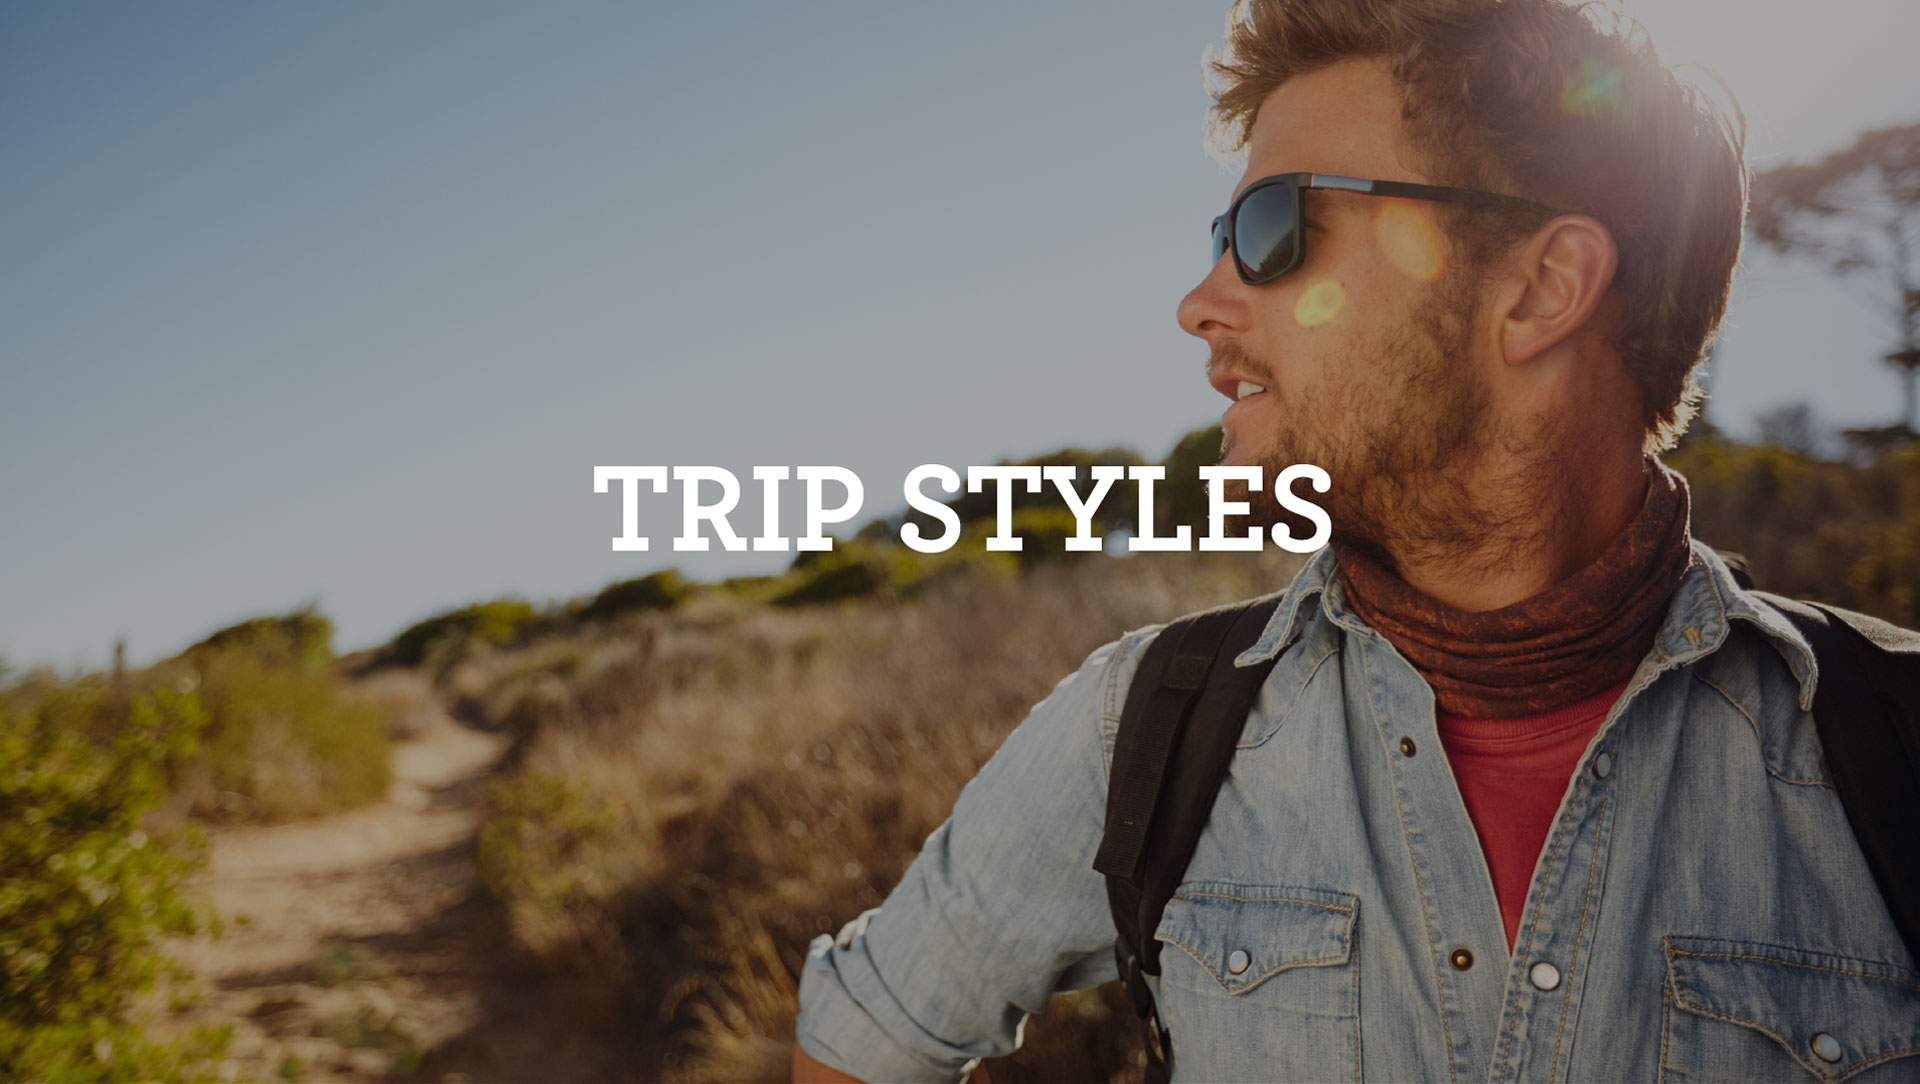 TRIP STYLES